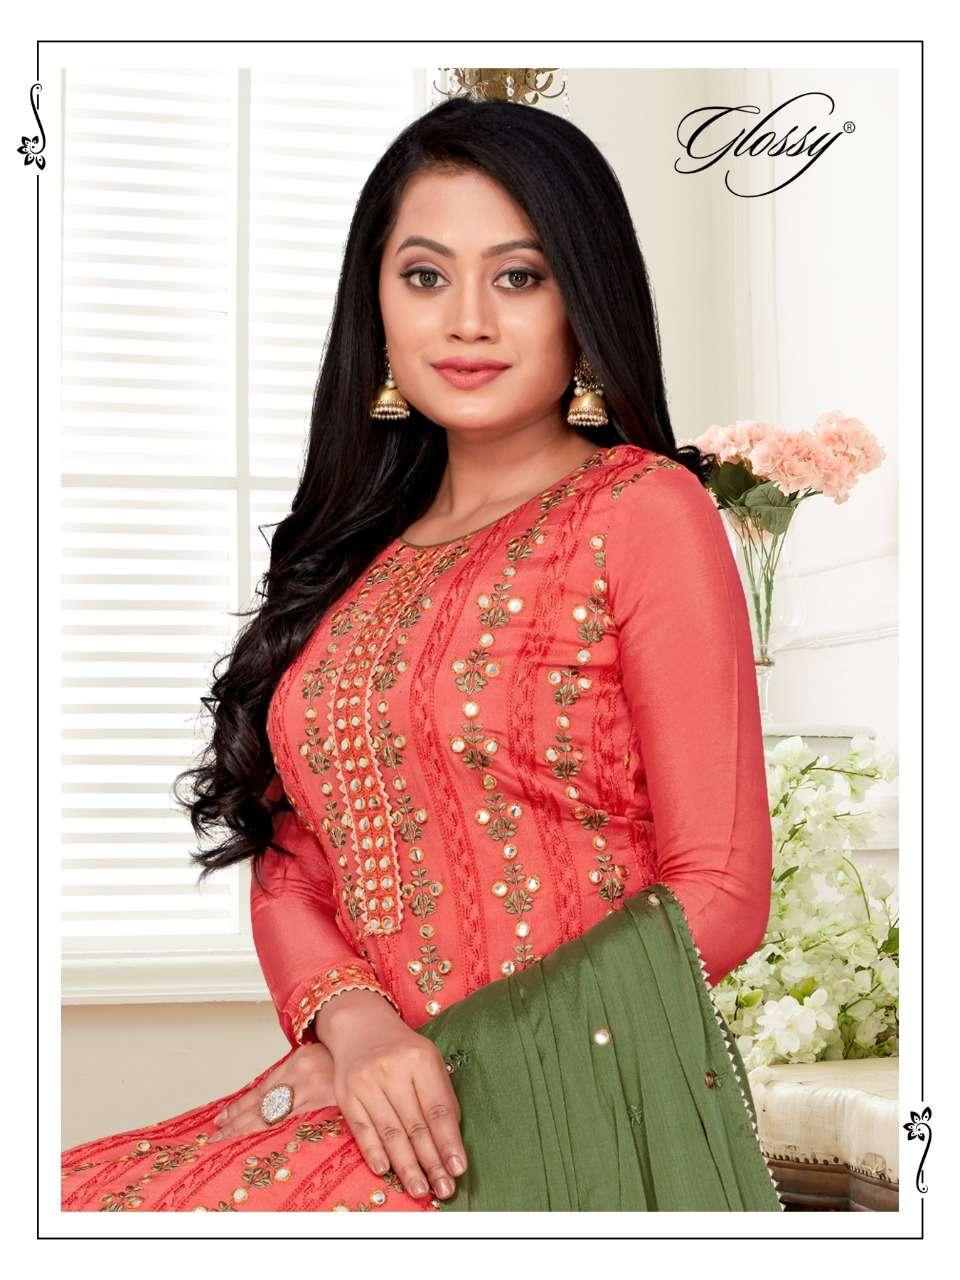 glossy jhullan sharara pattern salwar suits design supplier